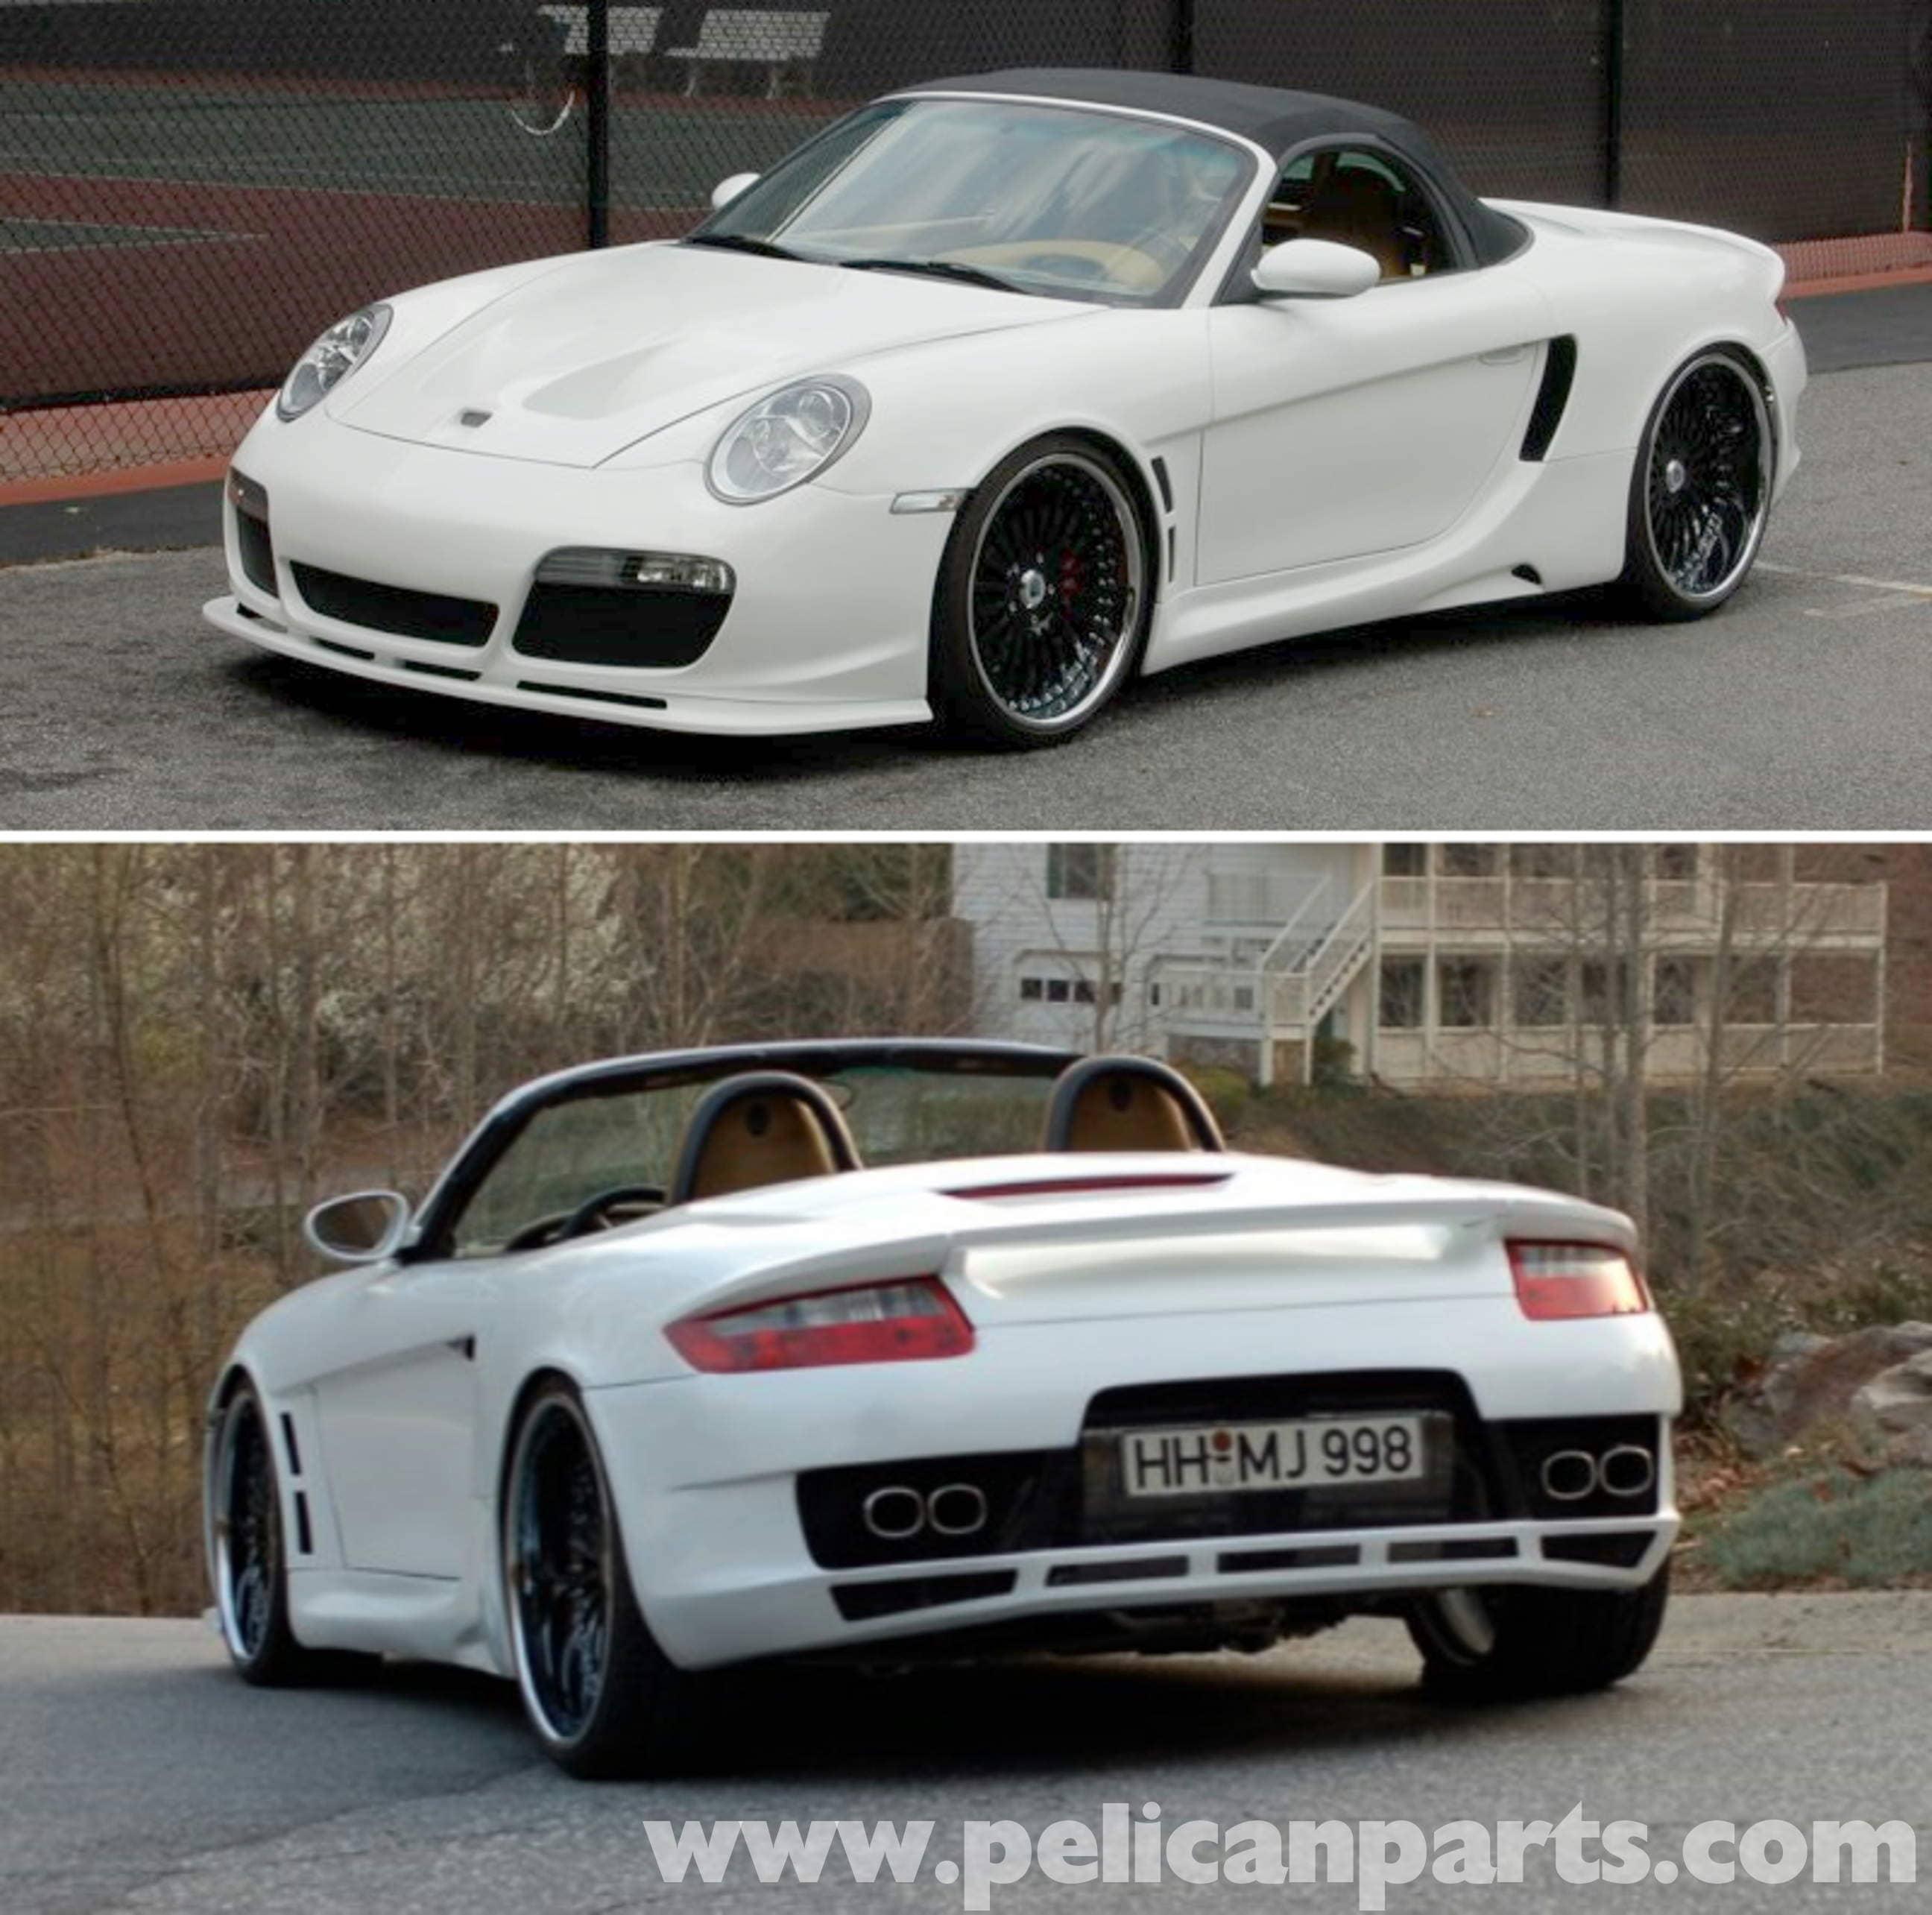 Porsche Boxster Personal Touches 986 987 1997 08 Pelican